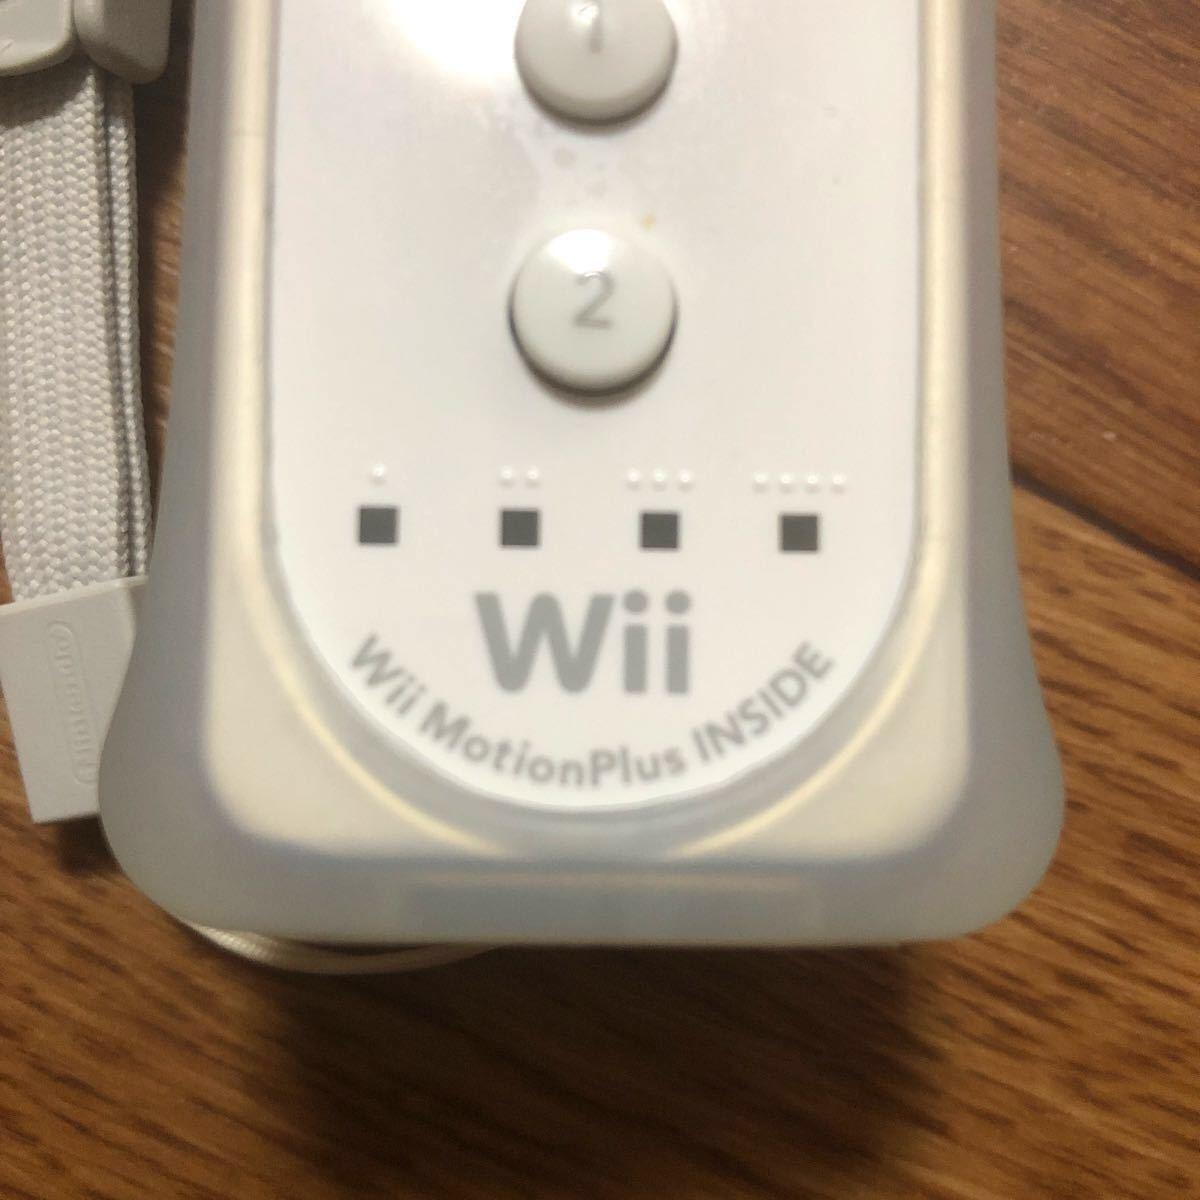 Wiiリモコンモーションプラス ヌンチャク Wiiクラシックコントローラ 白セット!